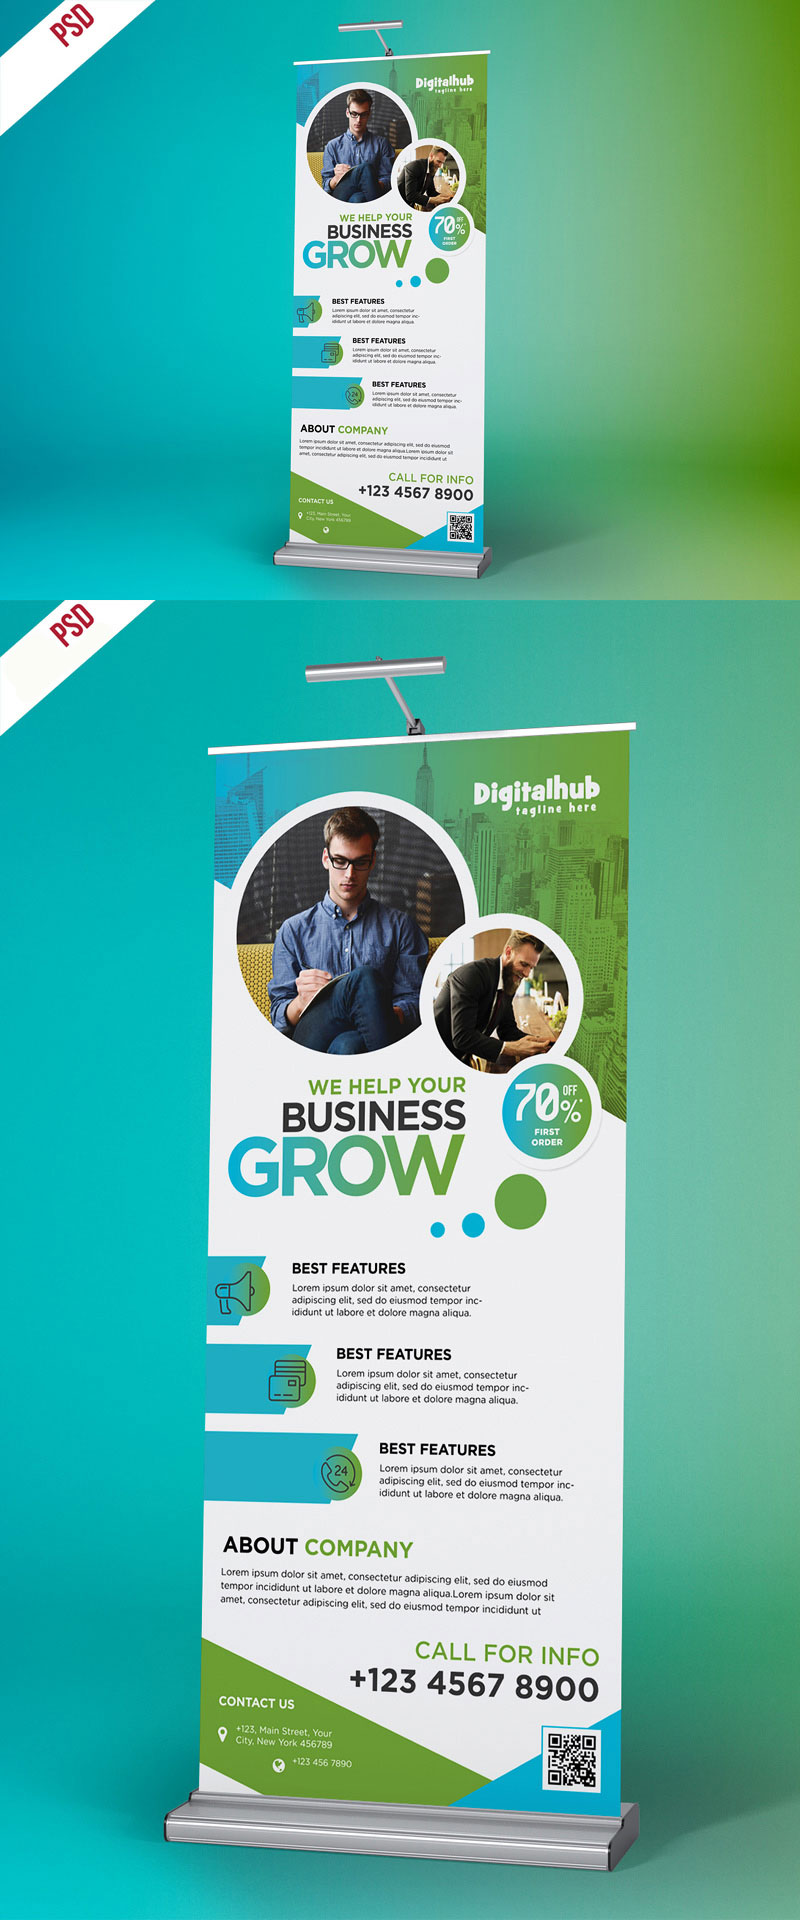 p336 - لایه باز استند تبلیغاتی معرفی محصولات شرکت و خدمات تجاری